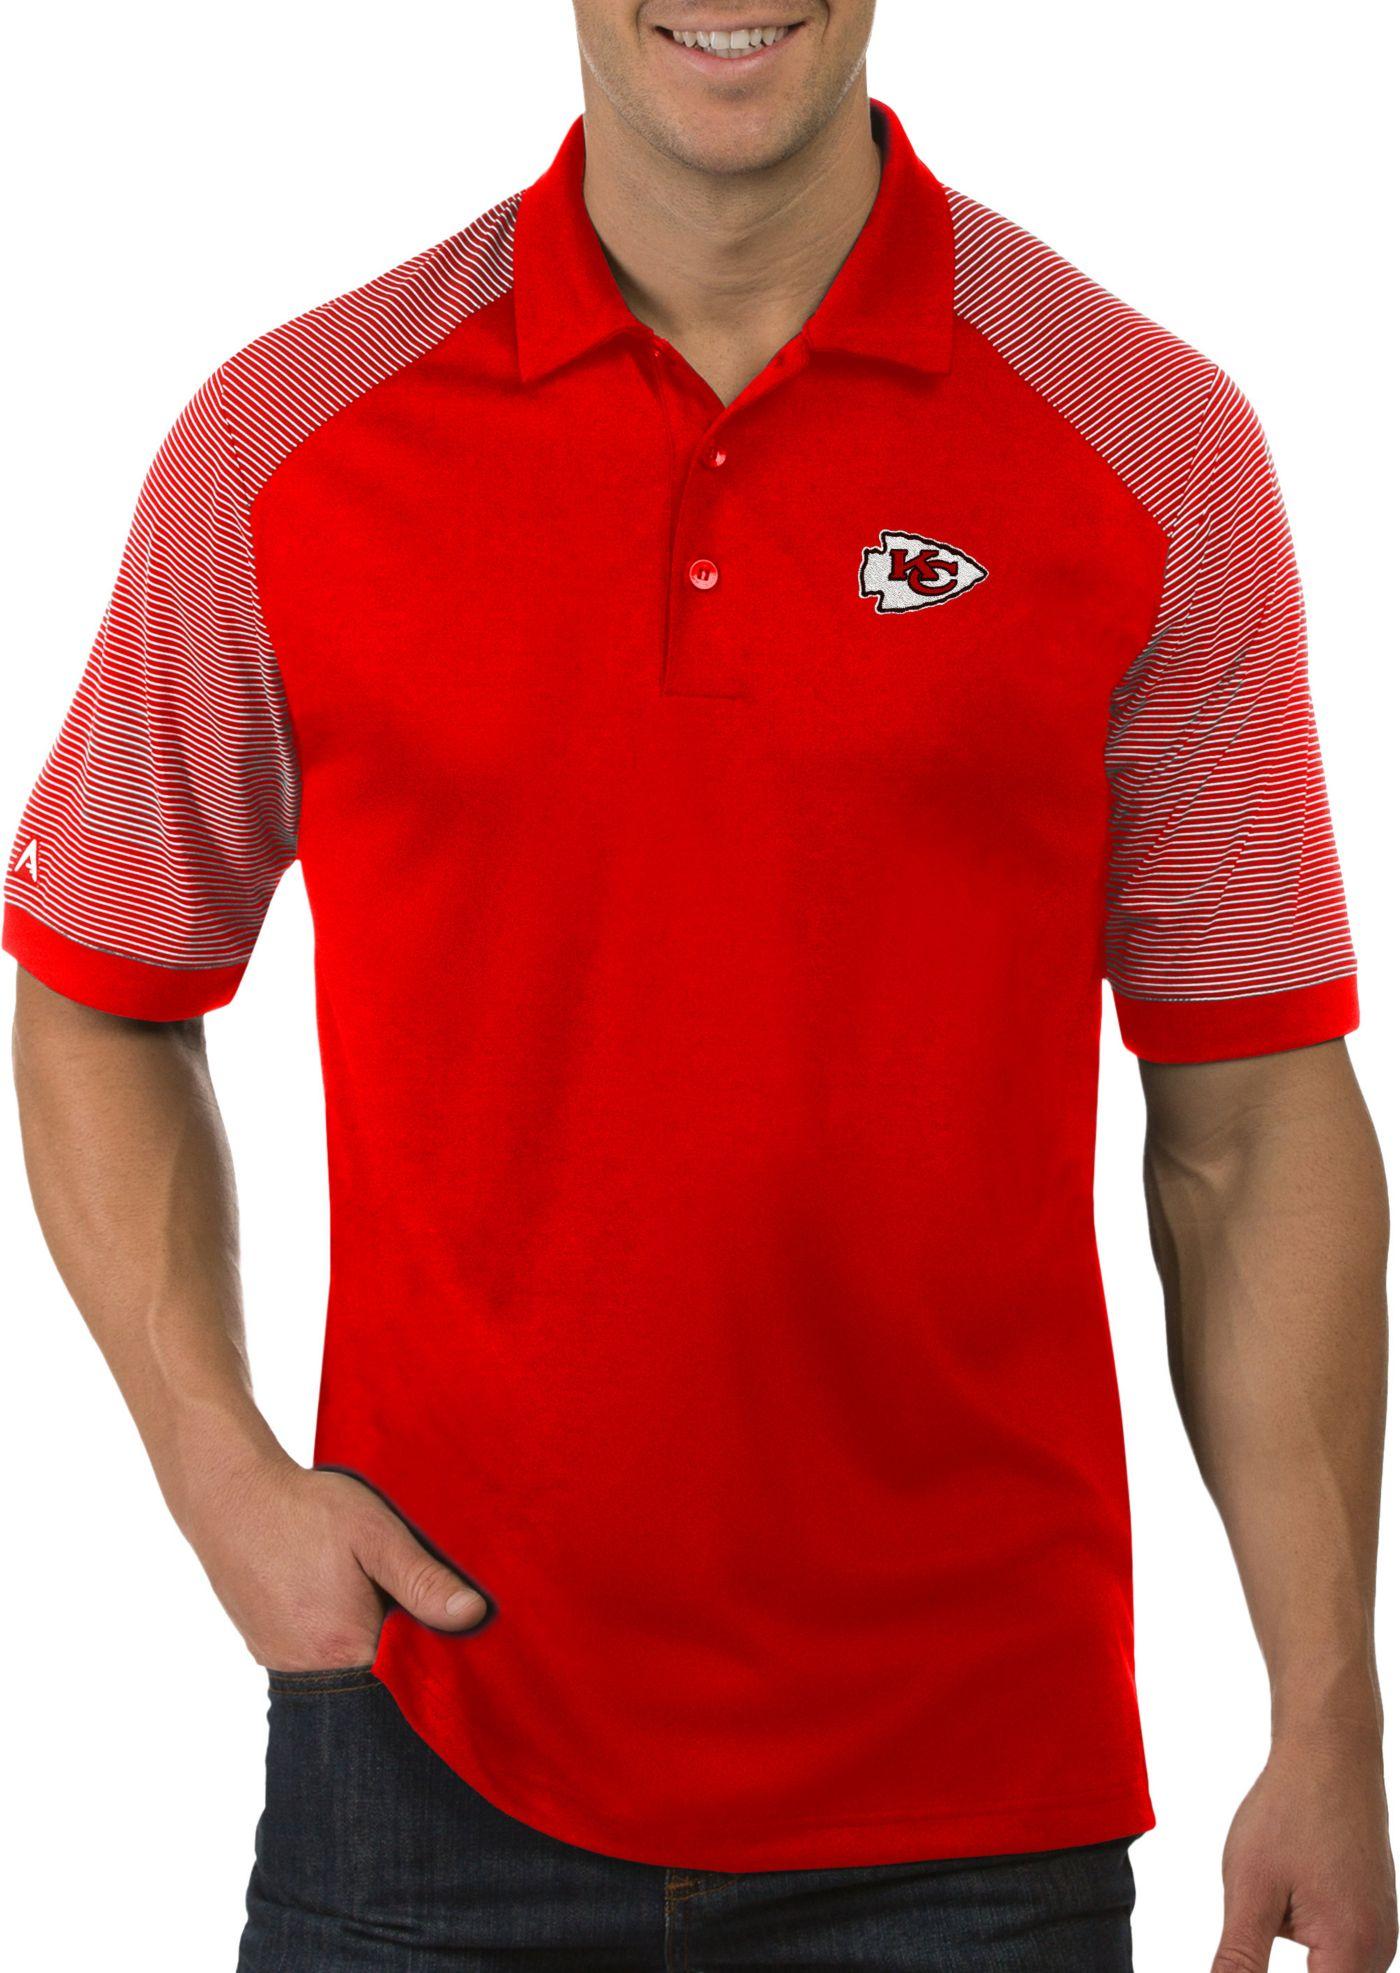 Antigua Men's Kansas City Chiefs Engage Red Performance Polo